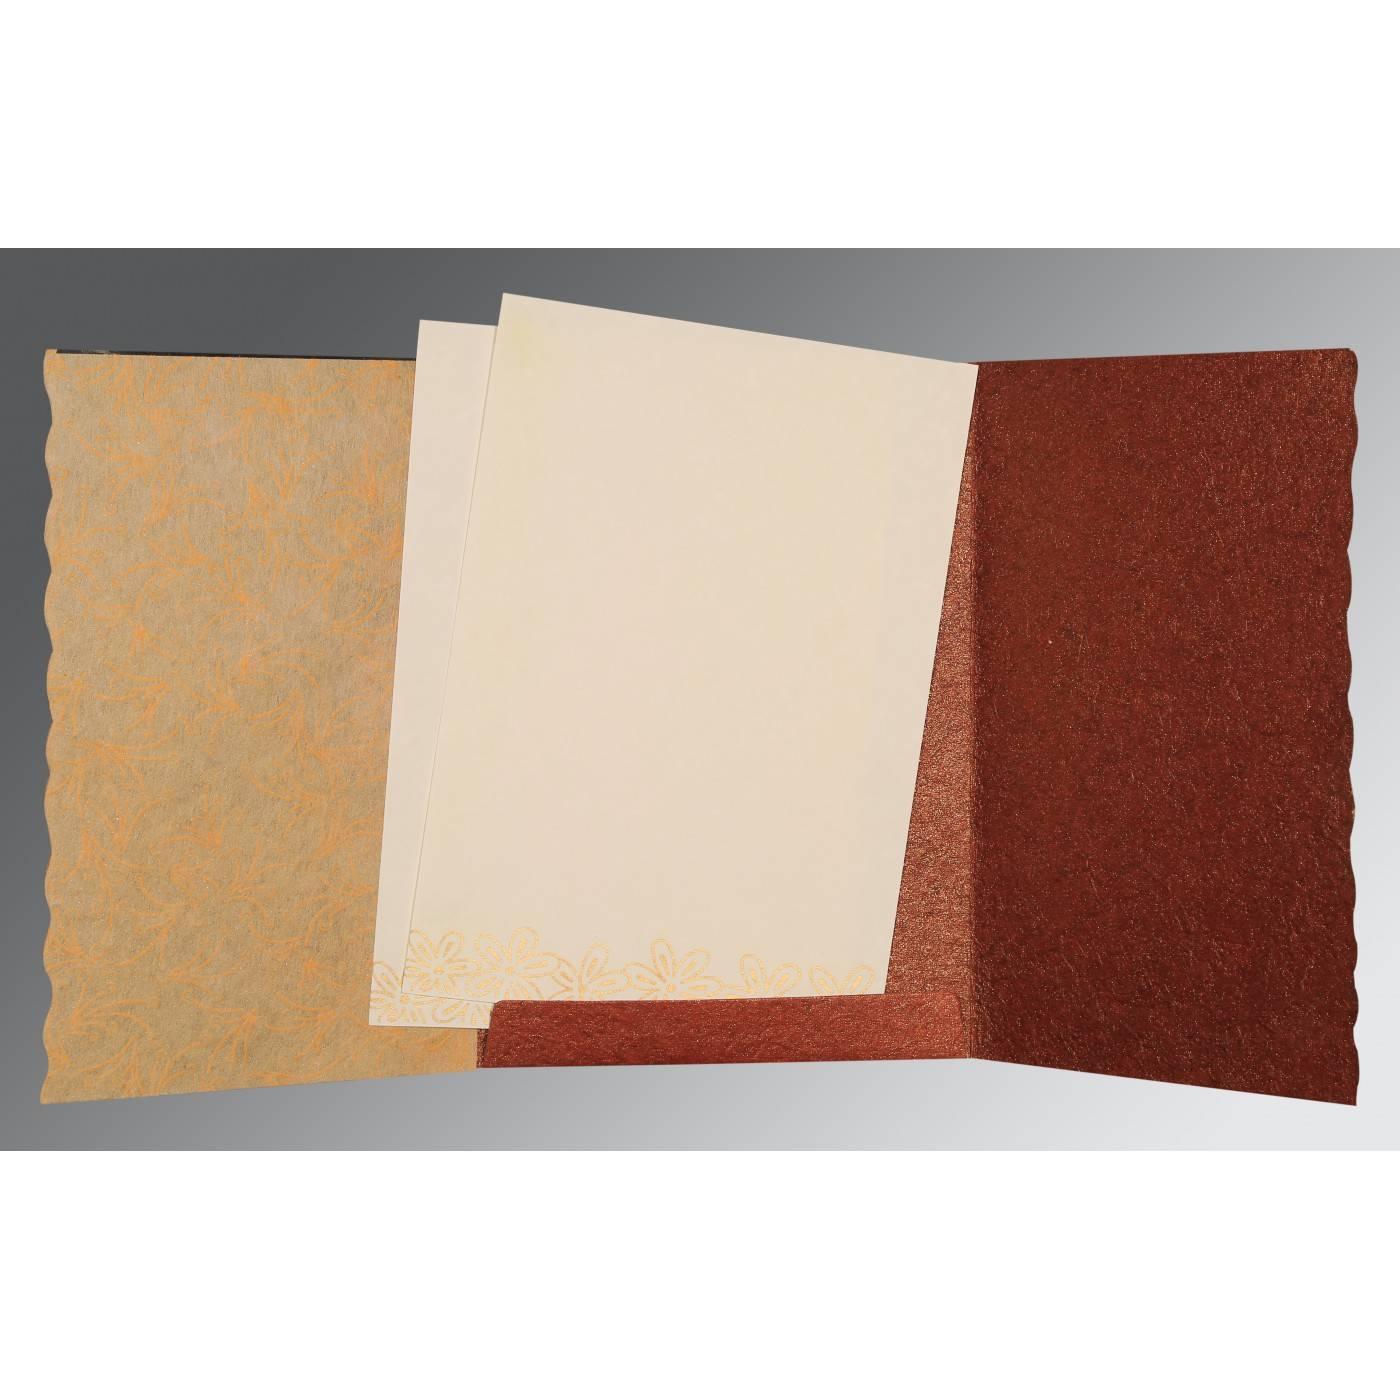 DESERT SAND BROWN HANDMADE SHIMMER FLORAL THEMED - SCREEN PRINTED WEDDING CARD : CG-1439 - IndianWeddingCards